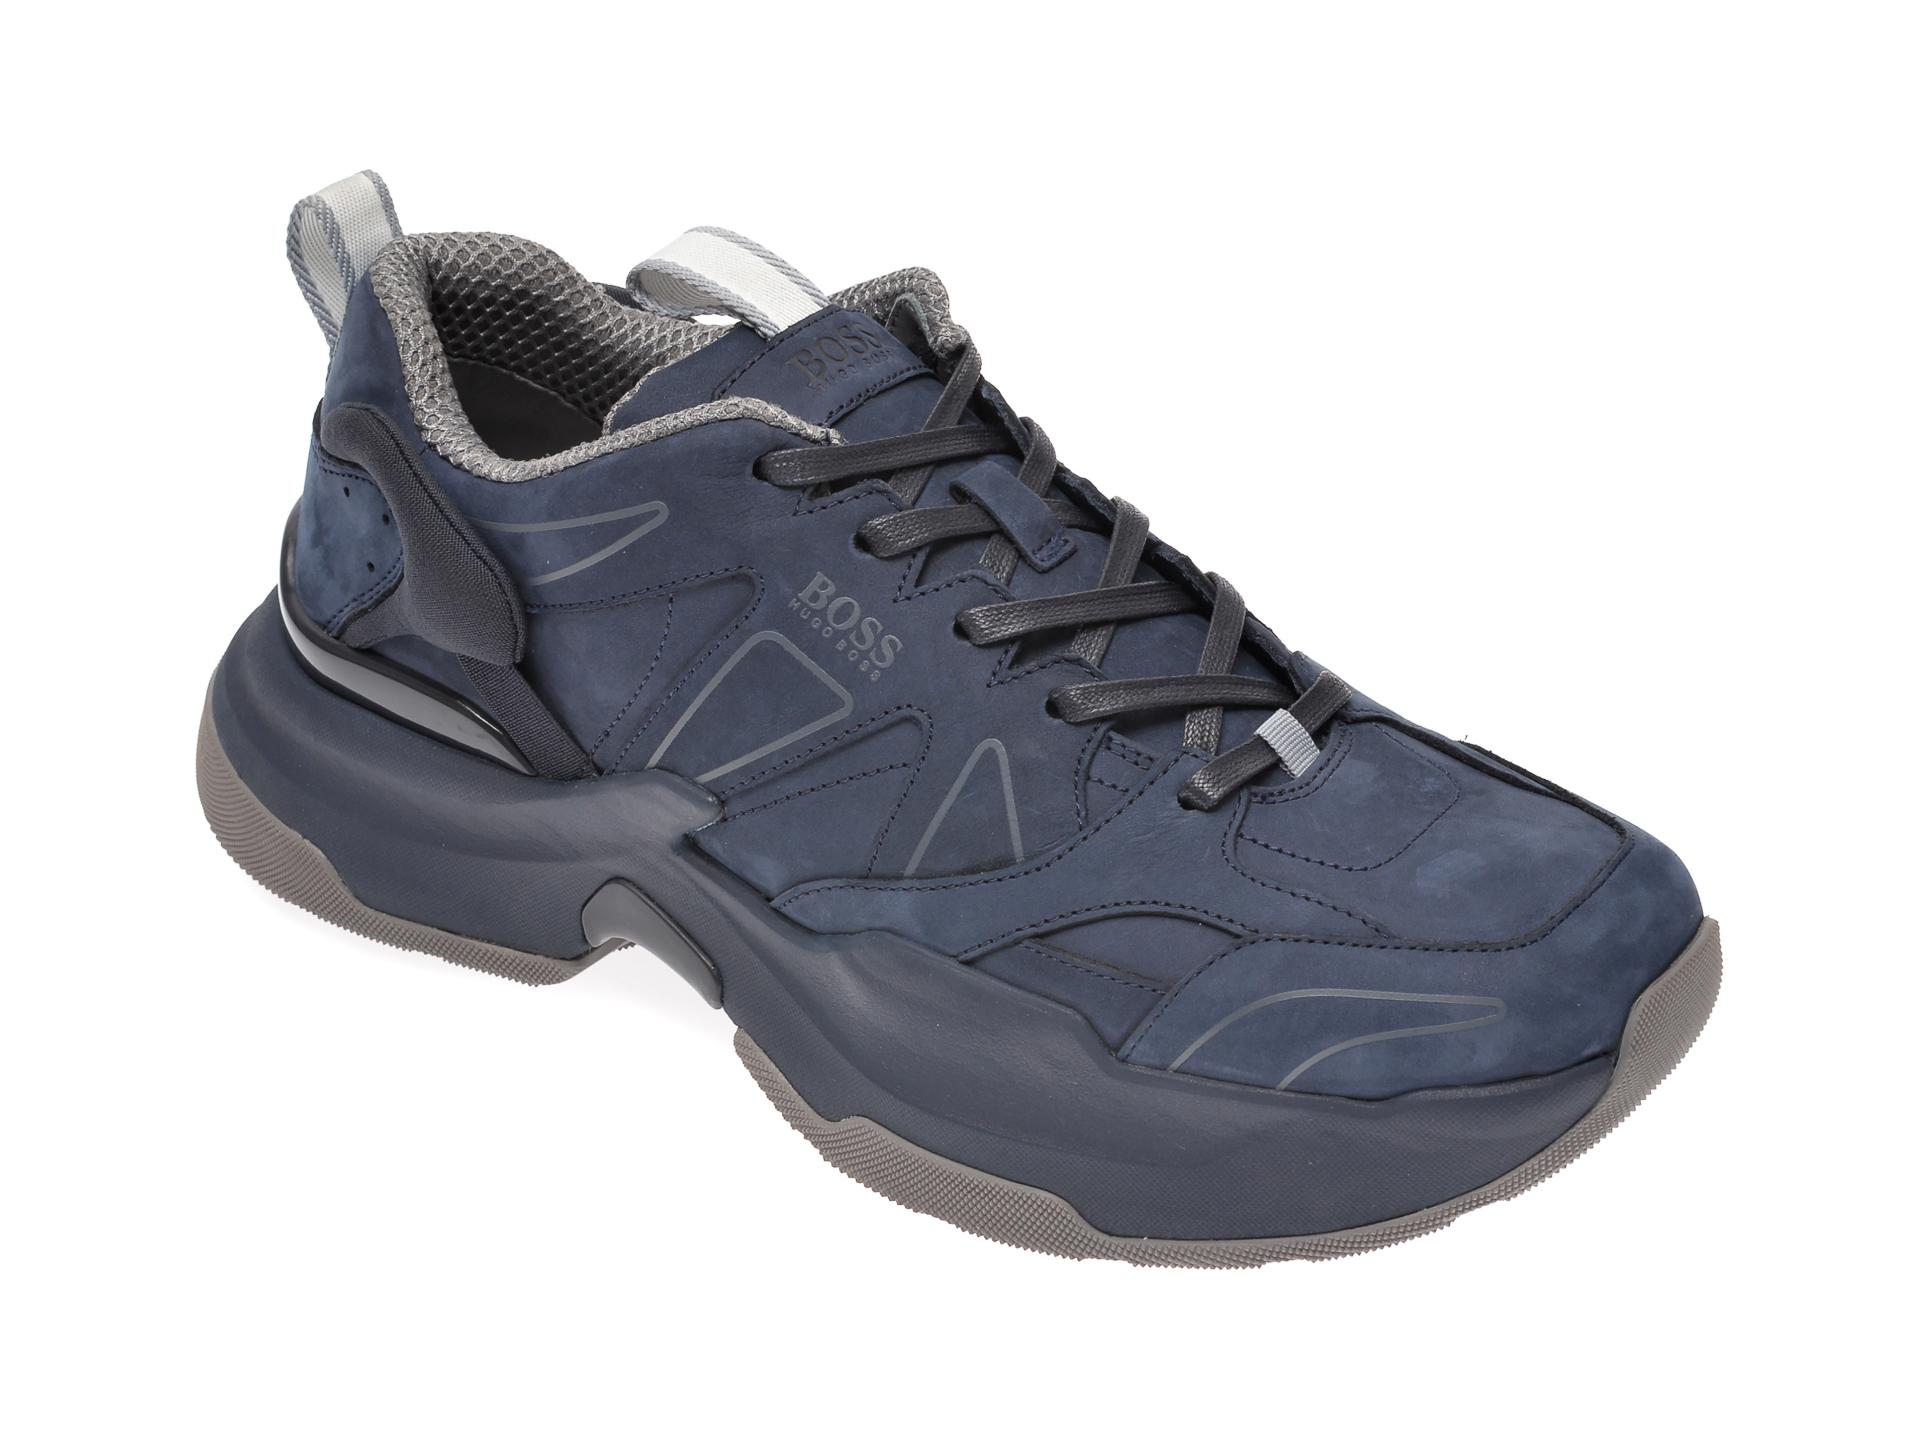 Pantofi sport HUGO BOSS bleumarin, 8593, din piele naturala imagine